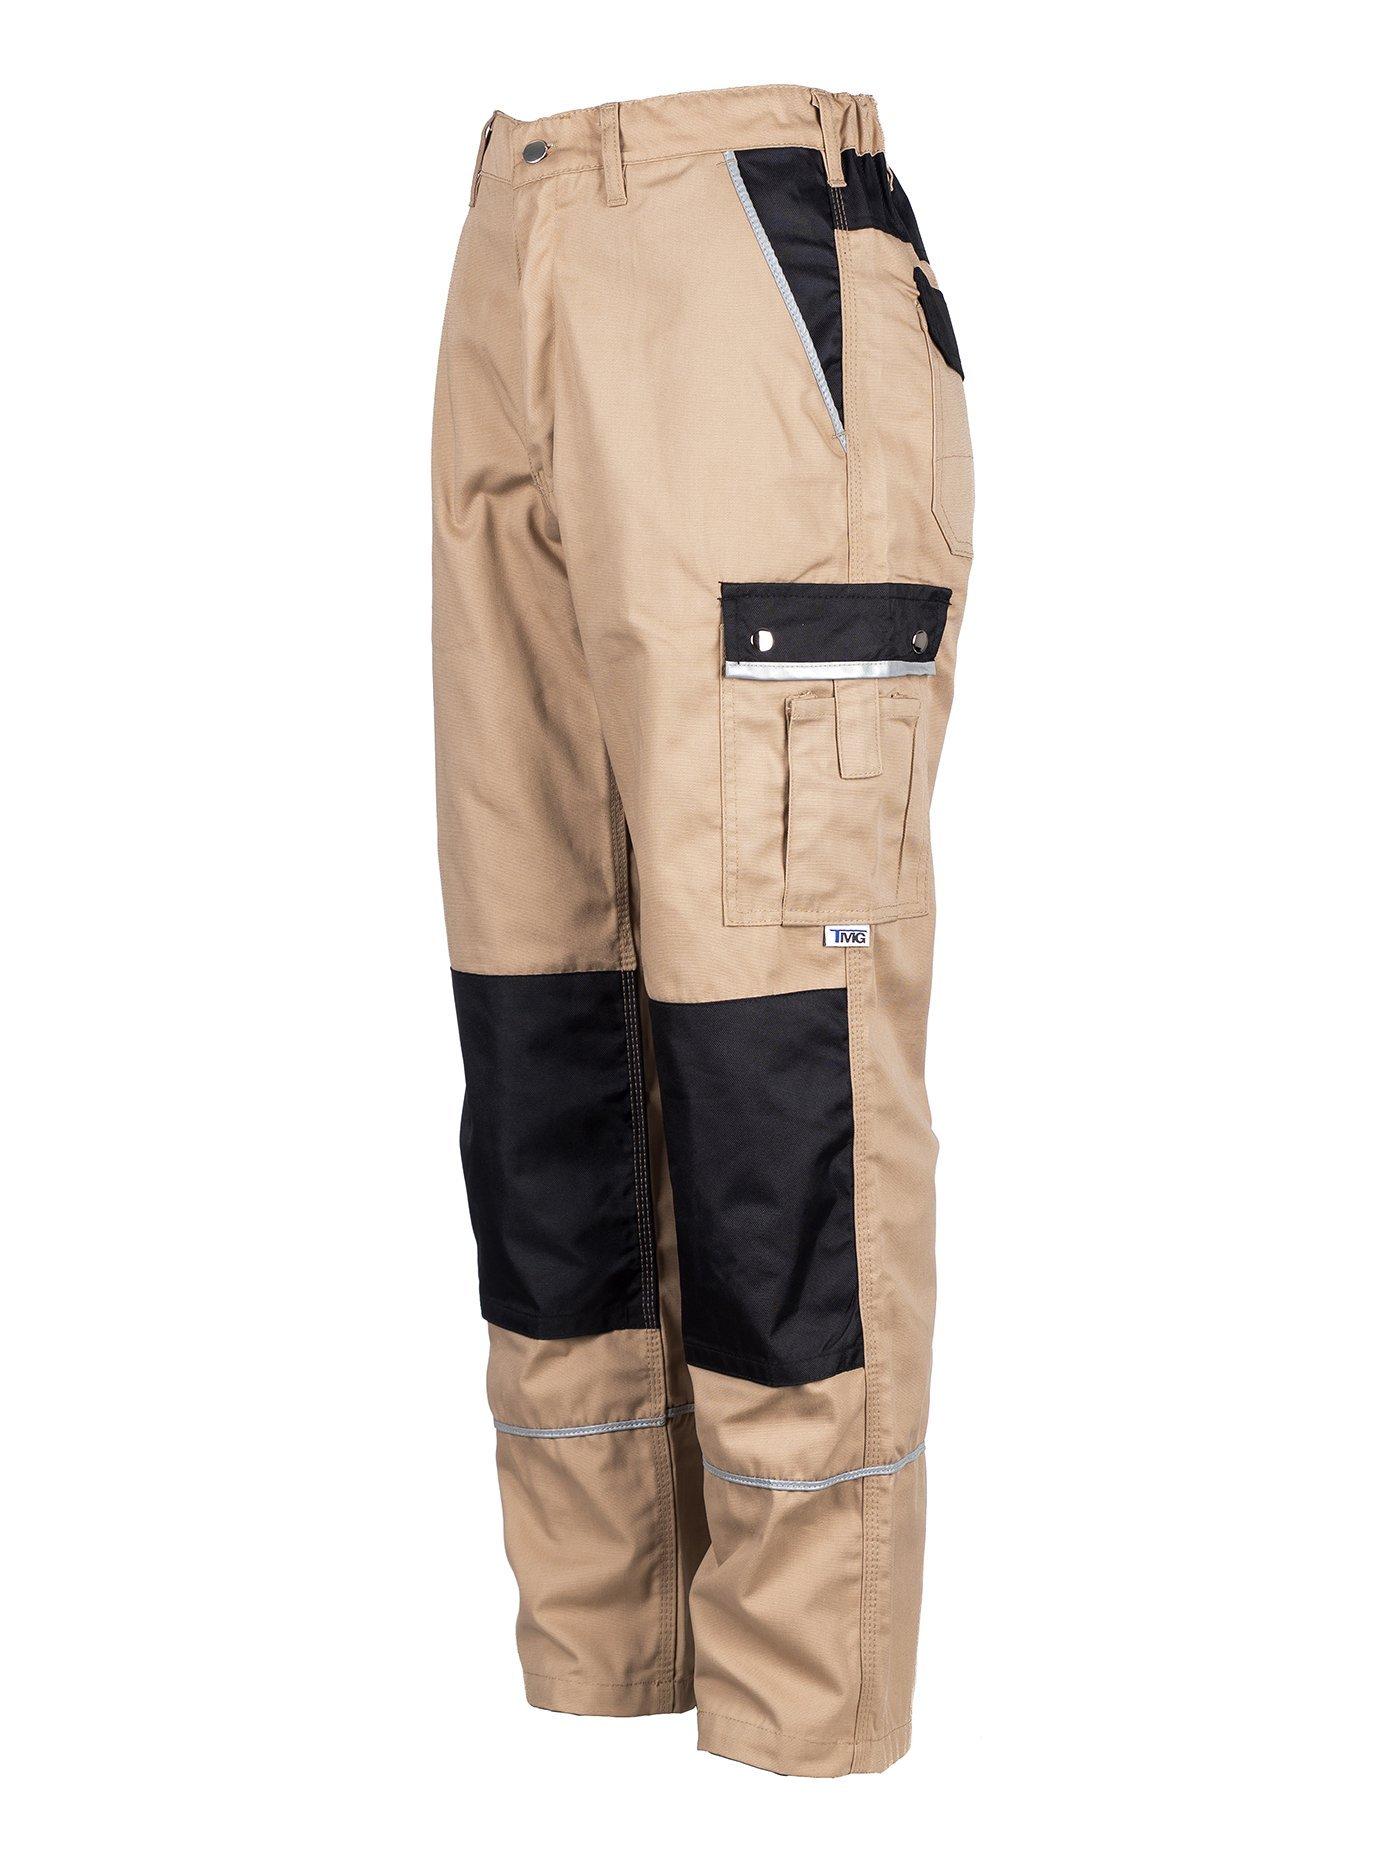 TMG Heavy Duty Cargo Work Trousers with Knee Pads Pockets 46 Beige